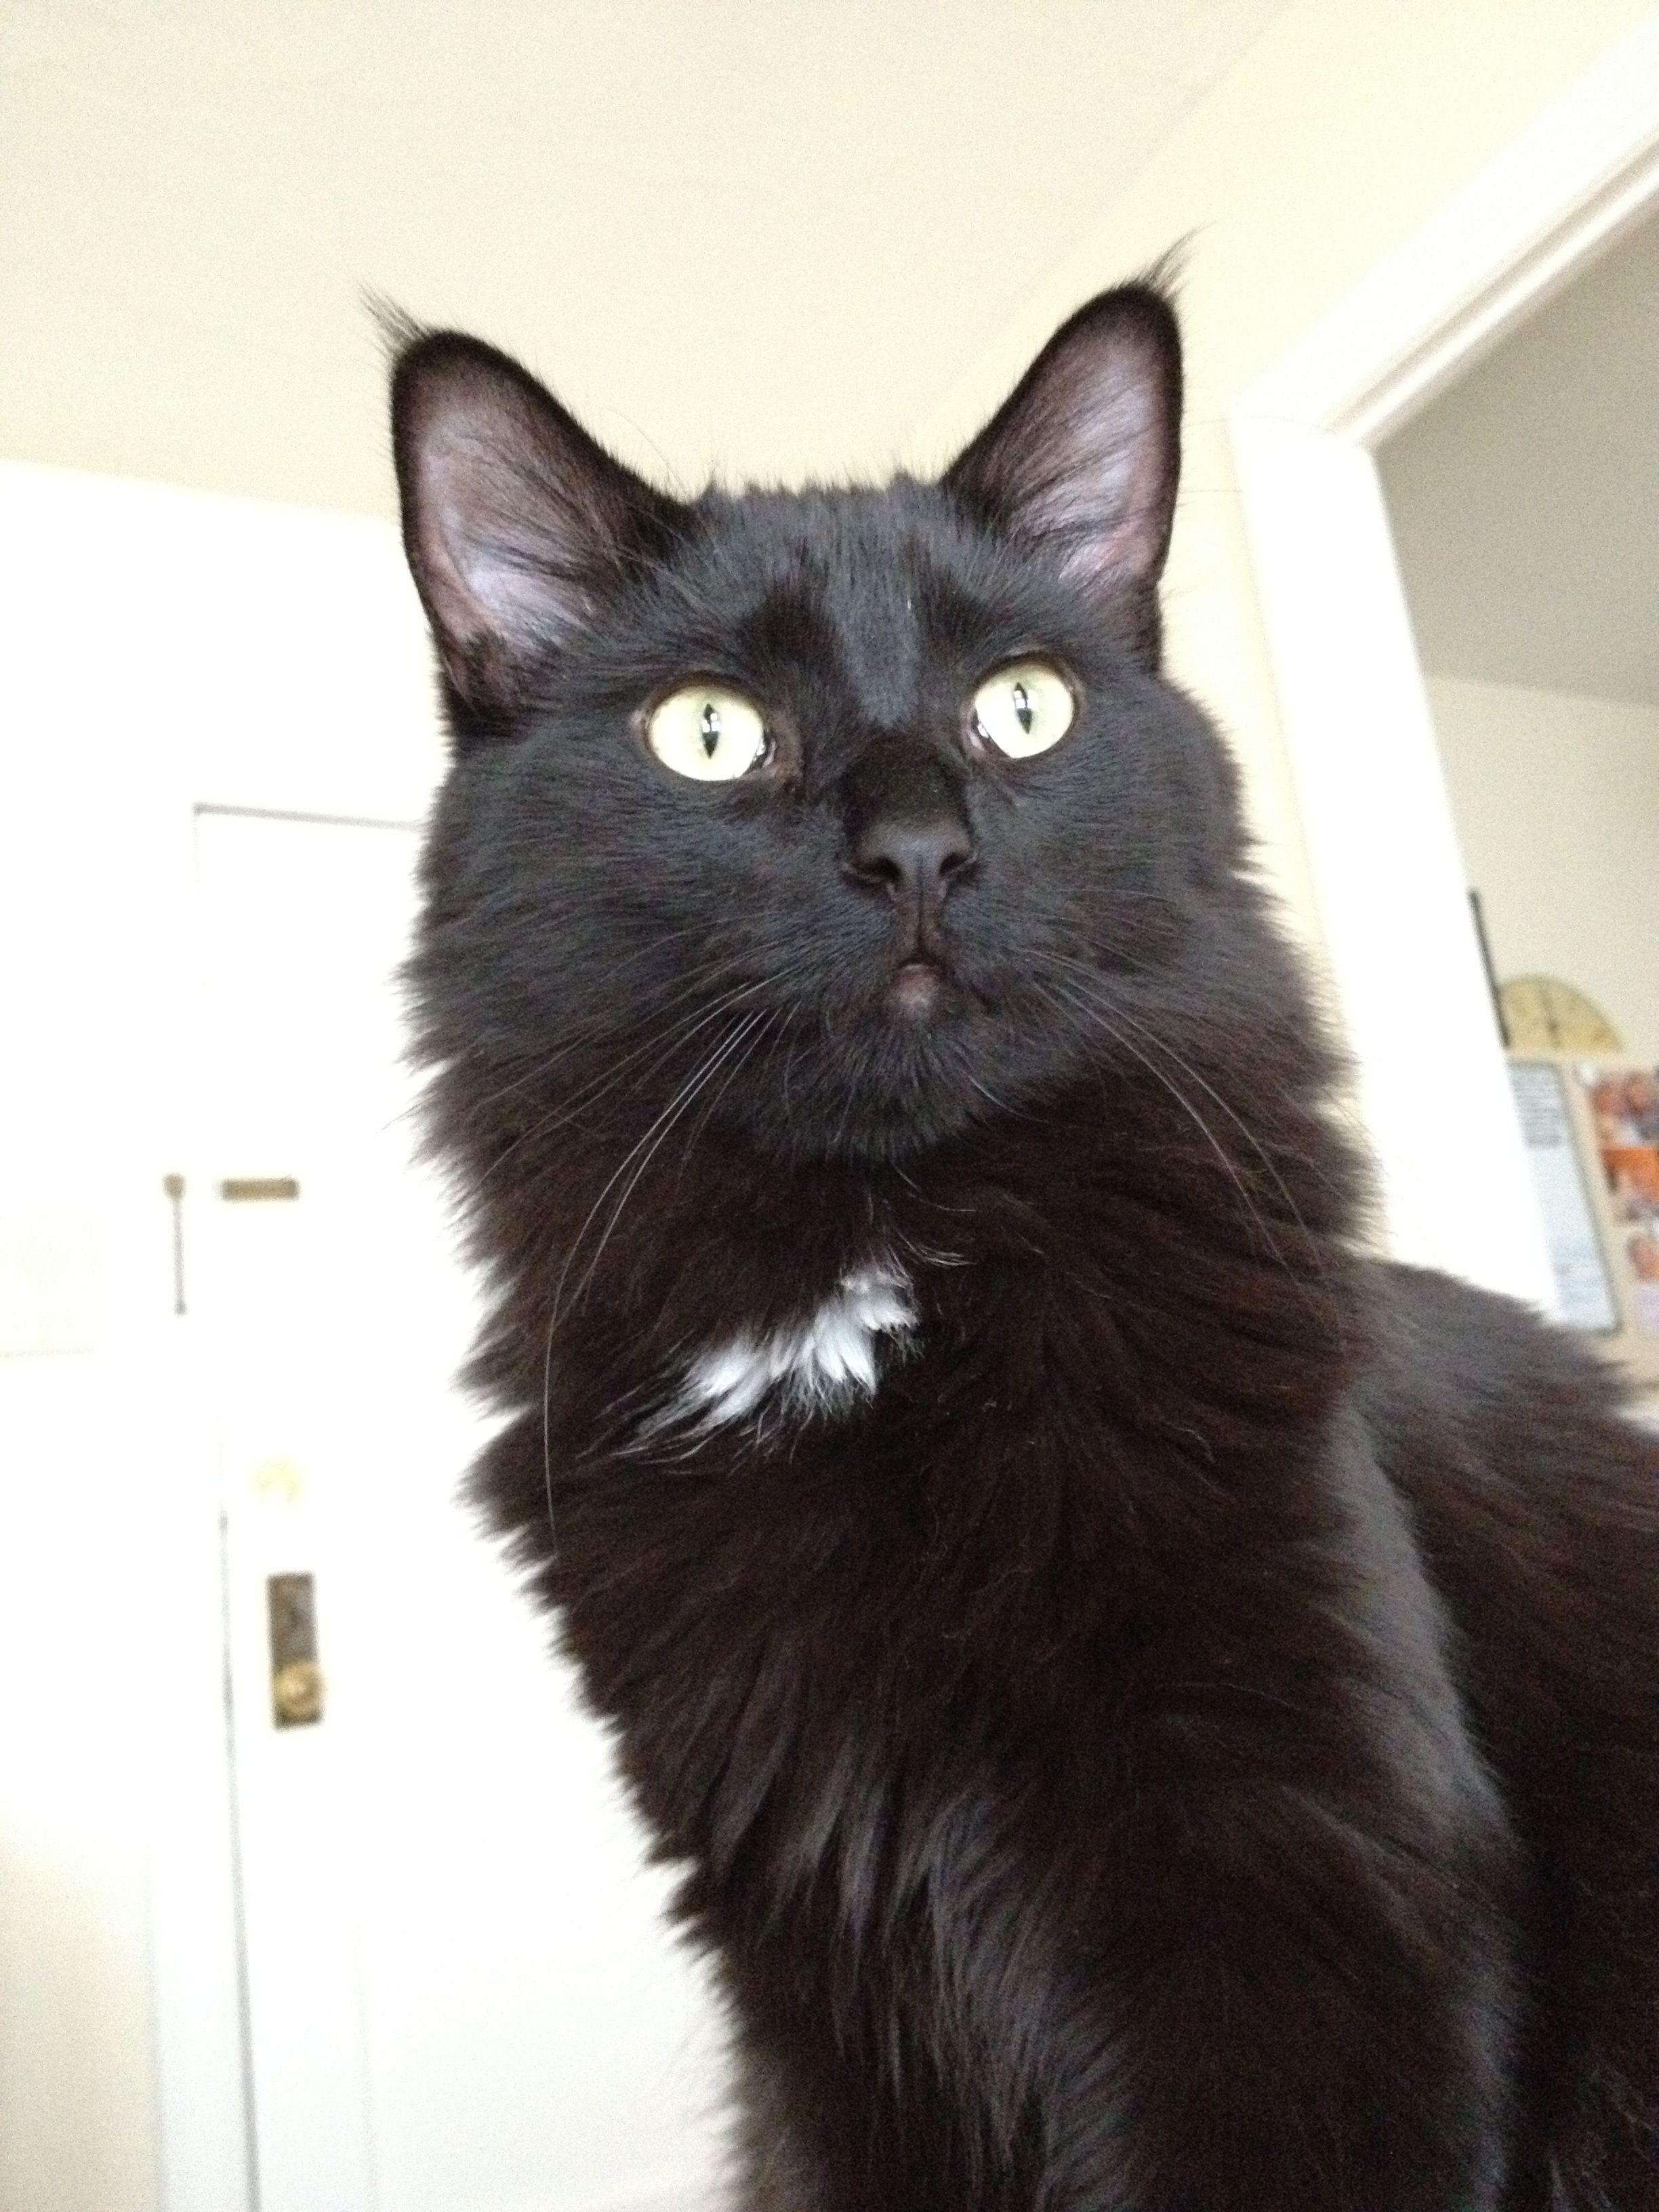 Adopt Jasper from Feline Rescue, Inc. St. Paul, MN http